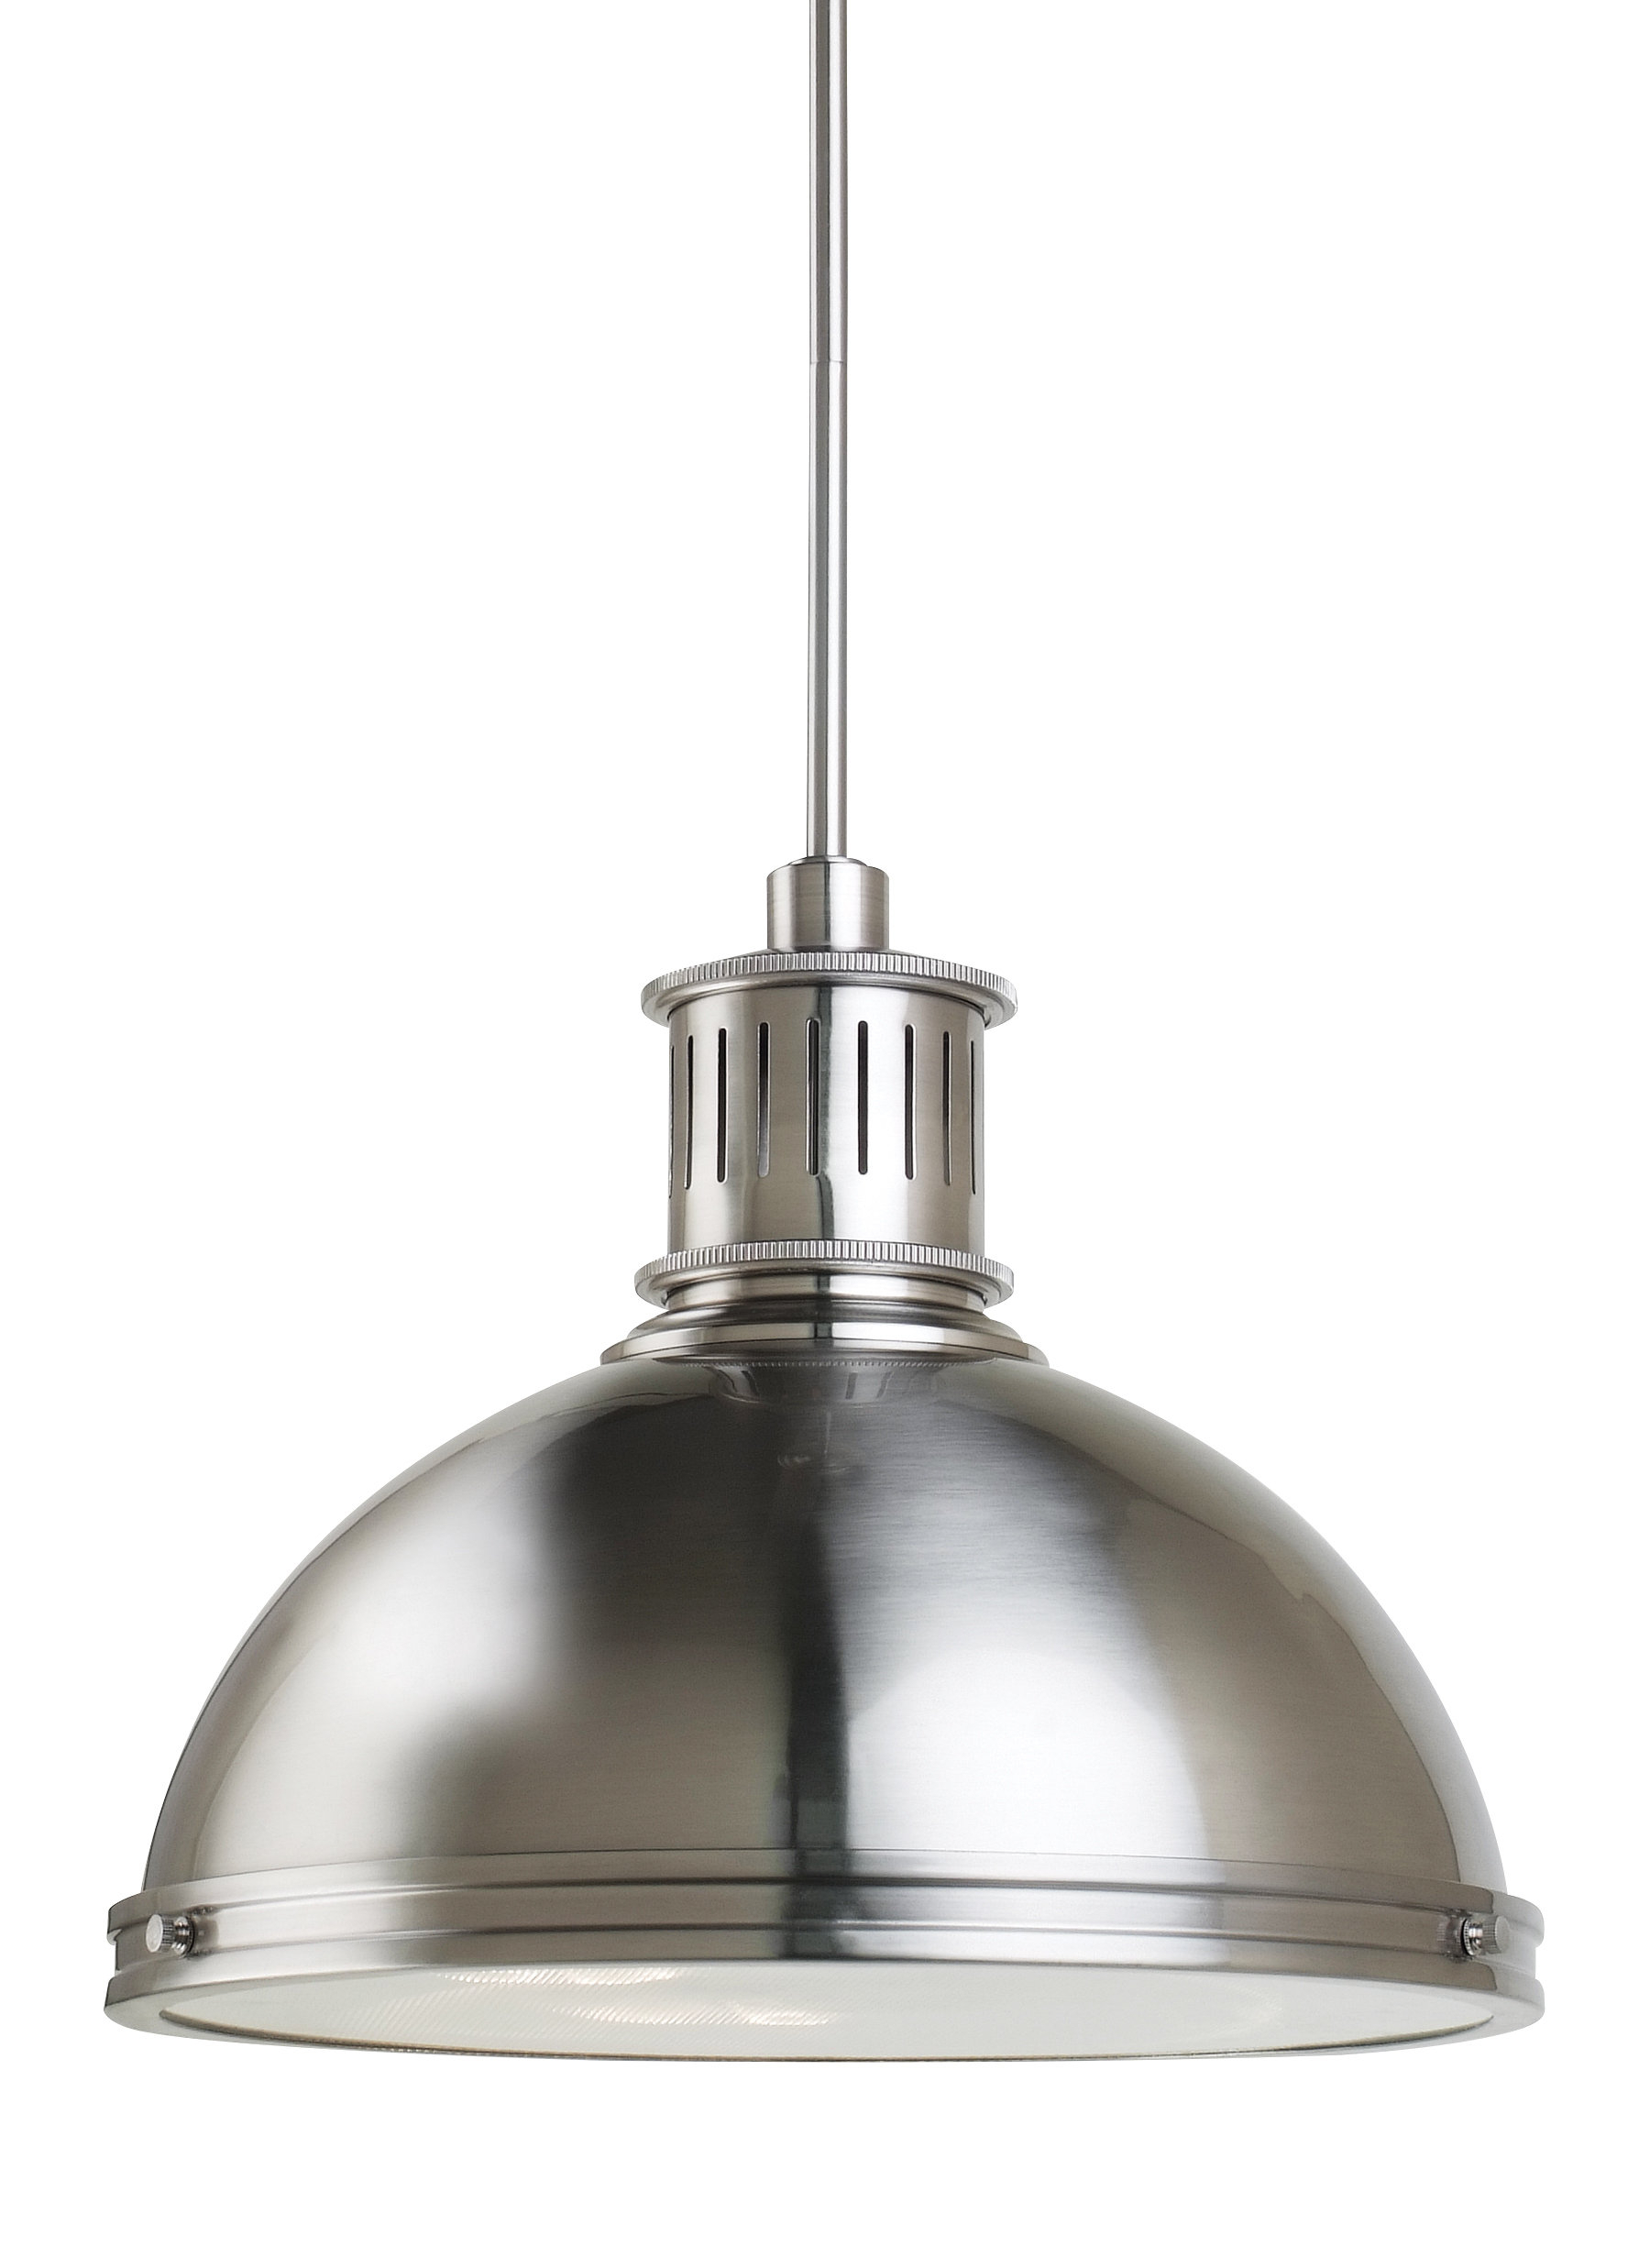 Amara 3 Light Dome Pendant For Ninette 1 Light Dome Pendants (View 11 of 30)